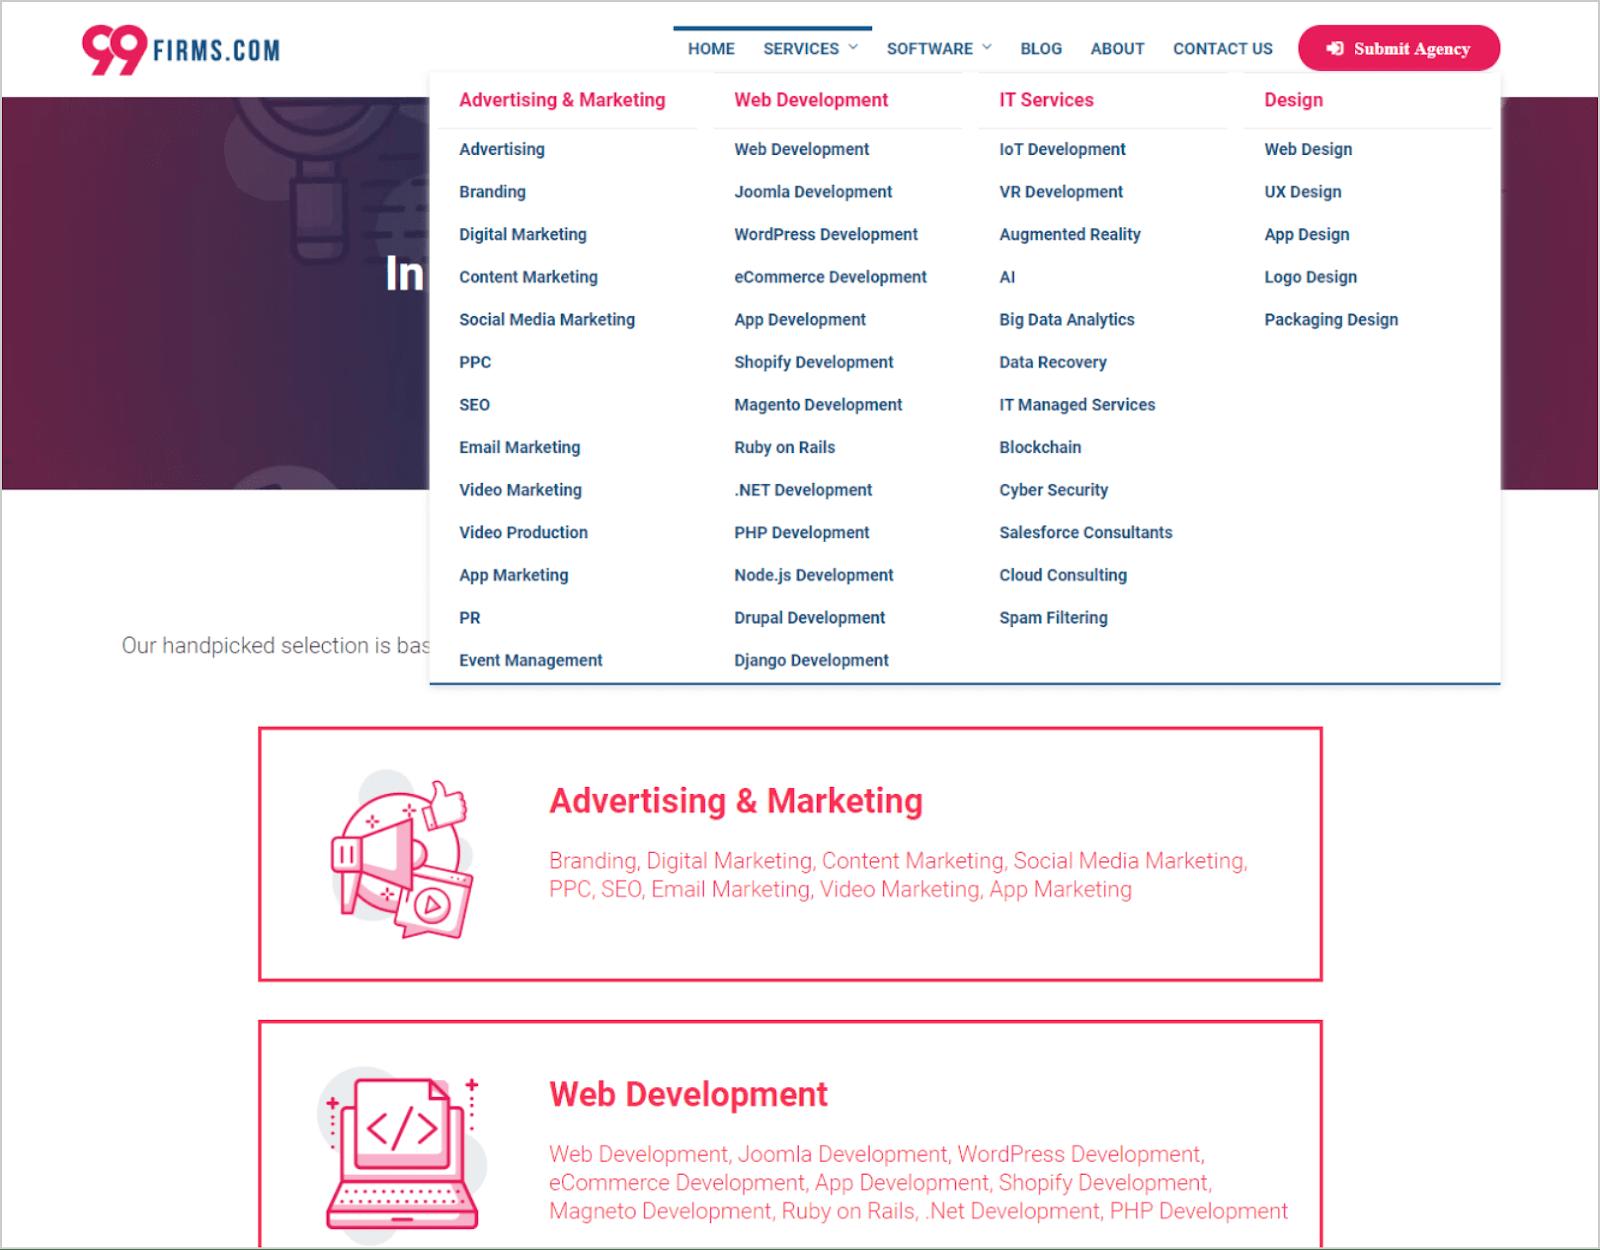 99Firms: Service categories